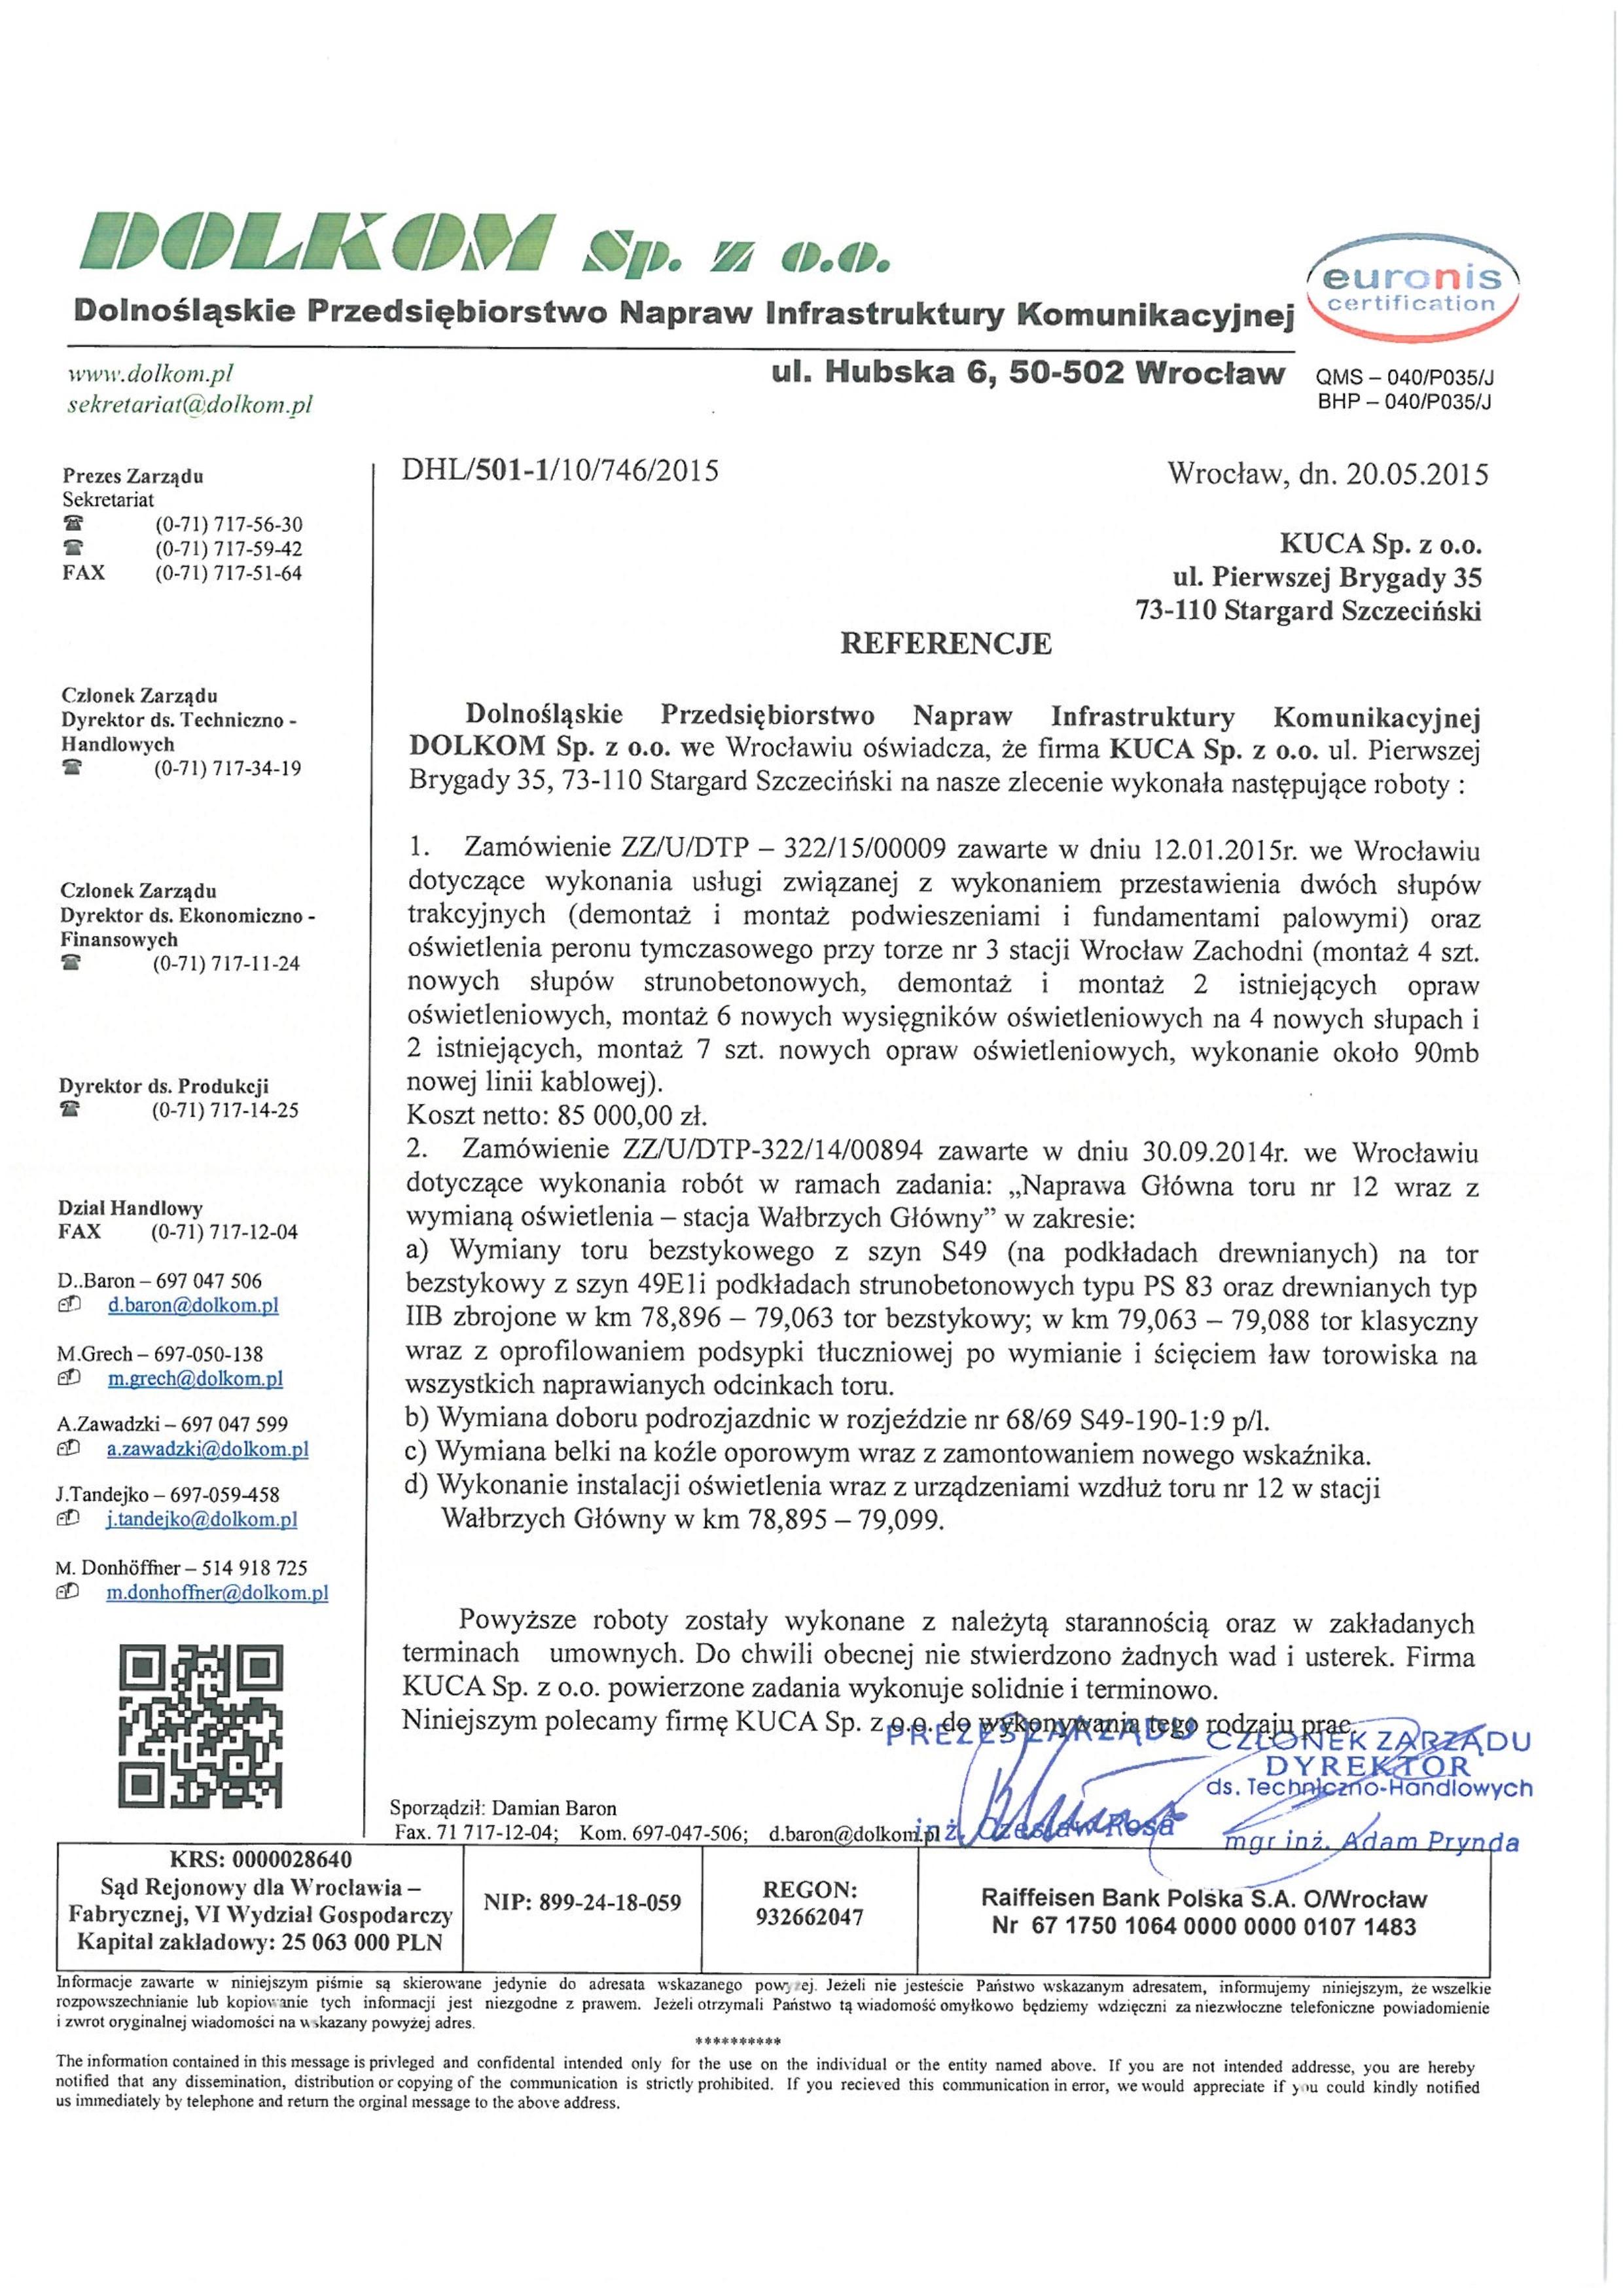 Referencje DOLKOM 20.05.2015